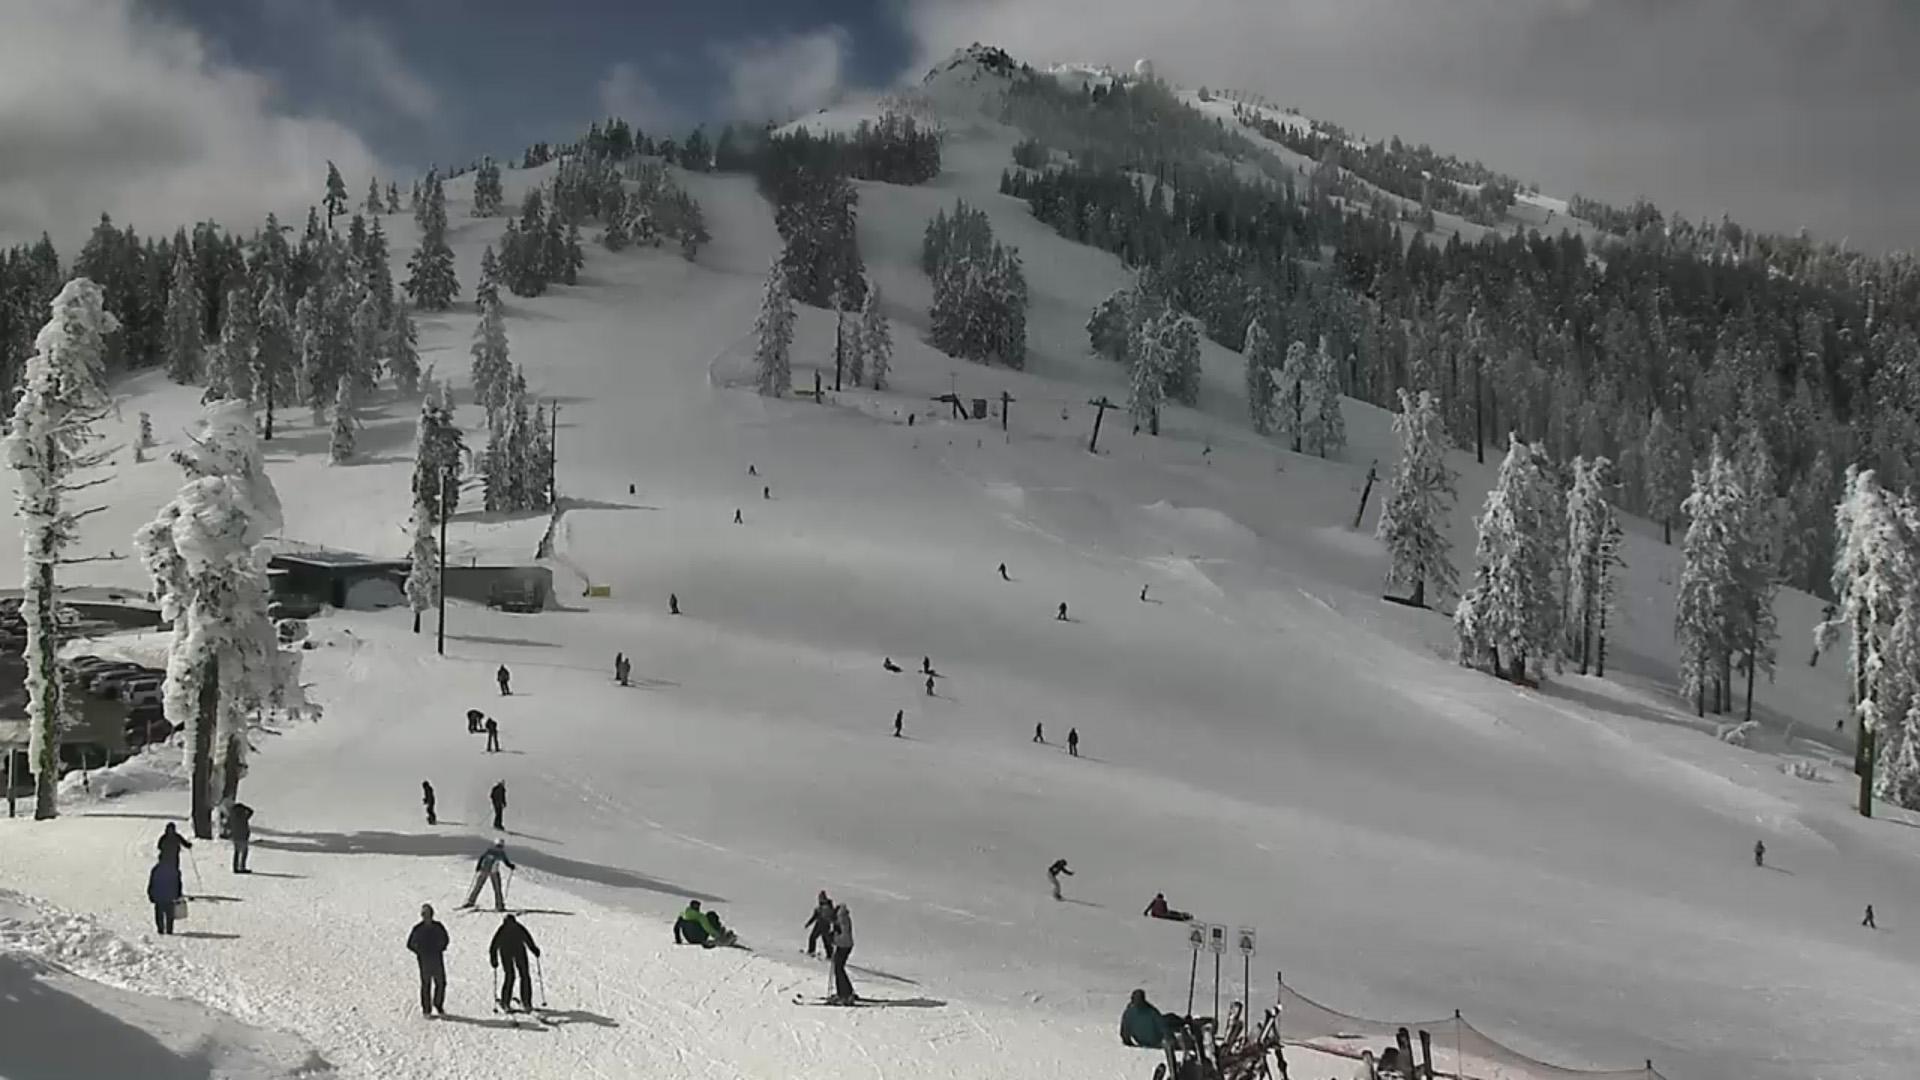 Lodge Camera, Mount Ashland. March 8, 2019